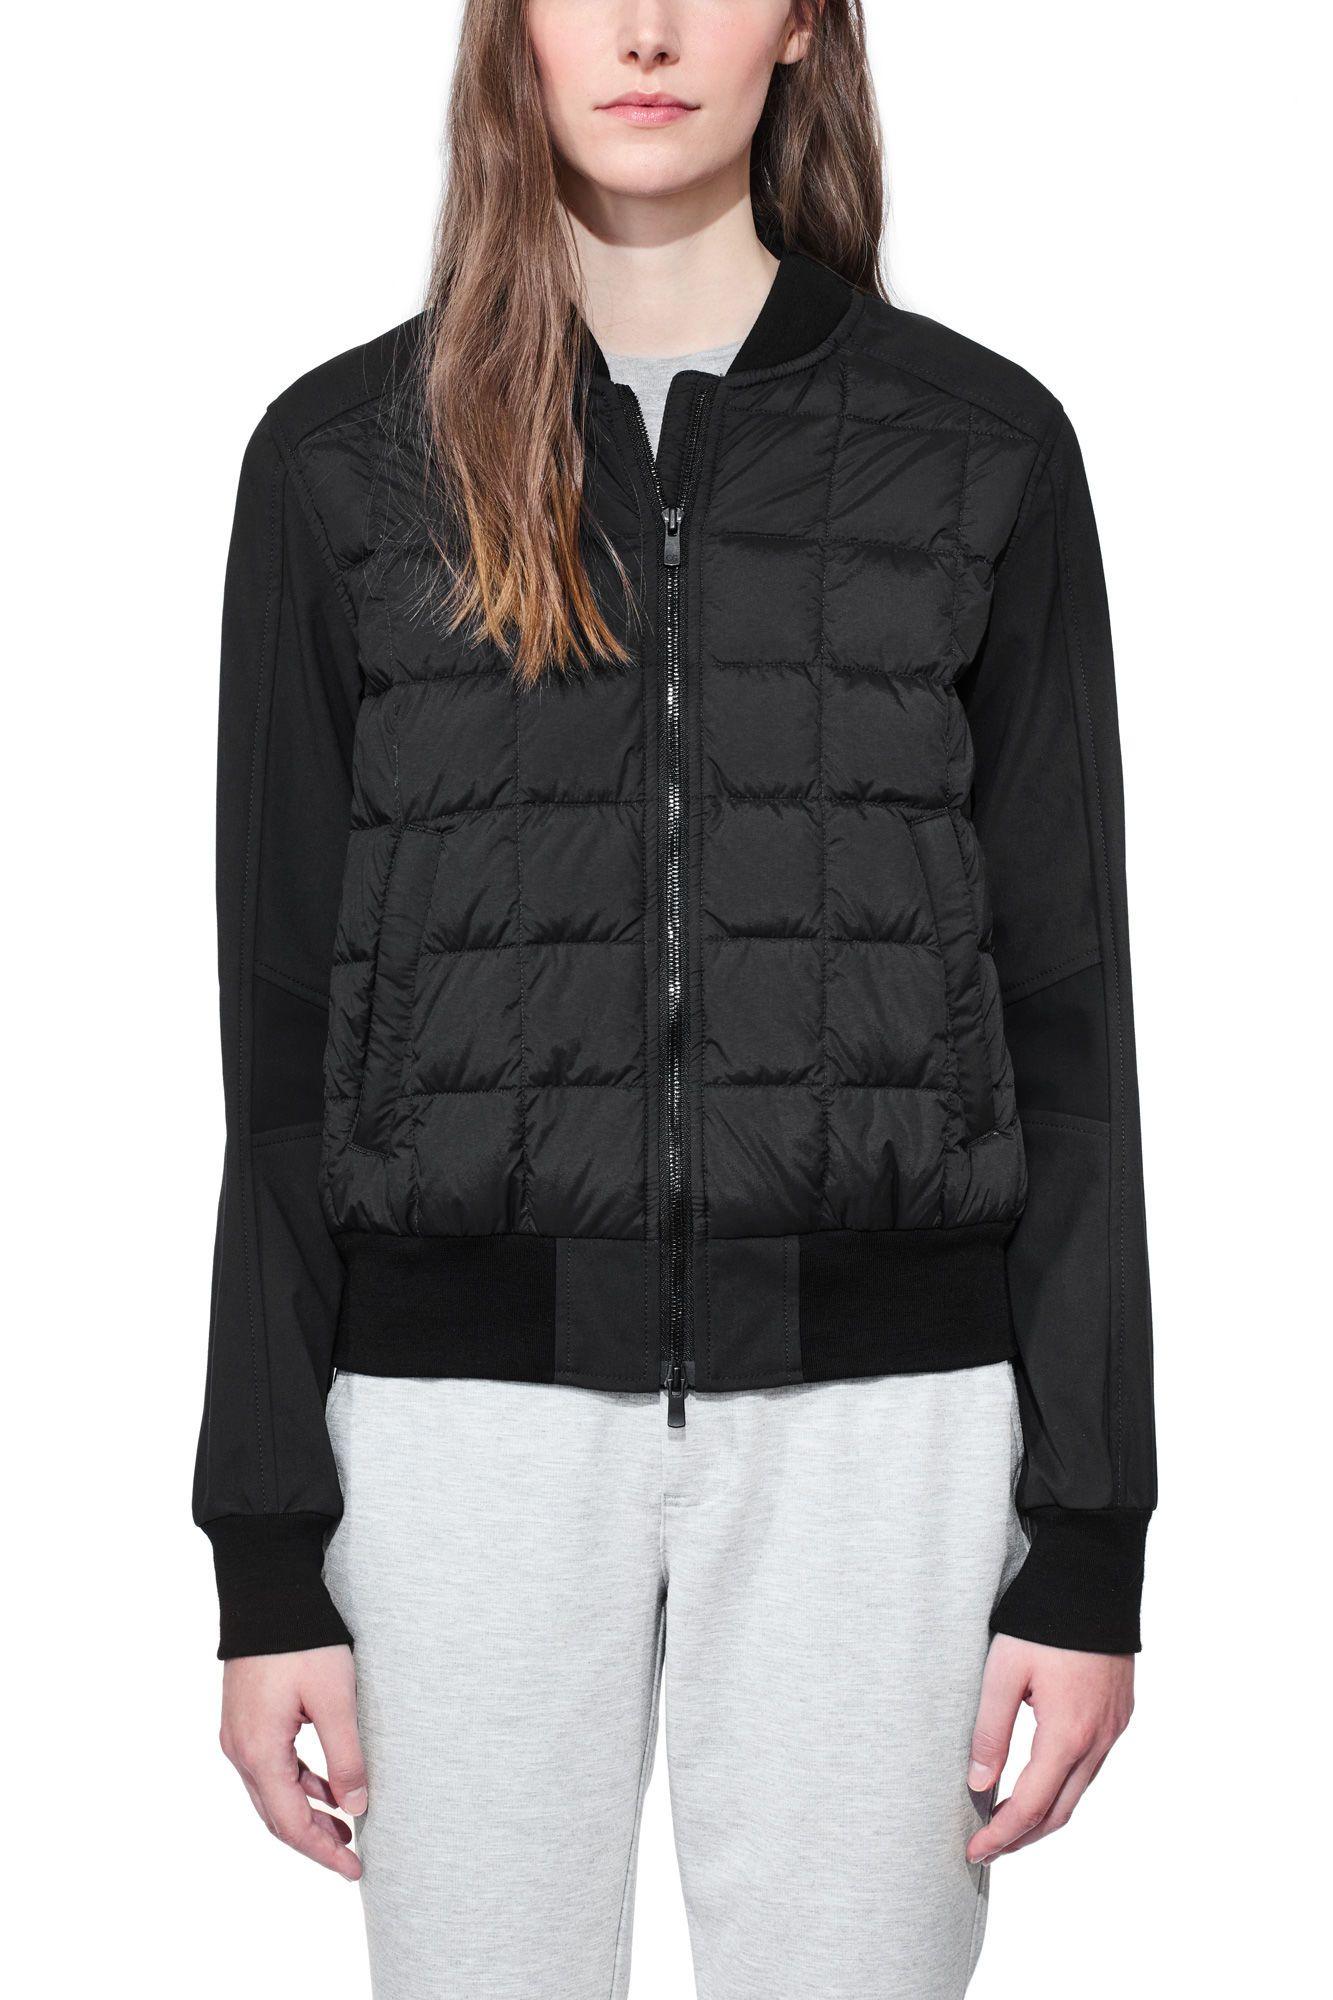 Hanley Bomber Canada Goose Jackets, Women clothes sale